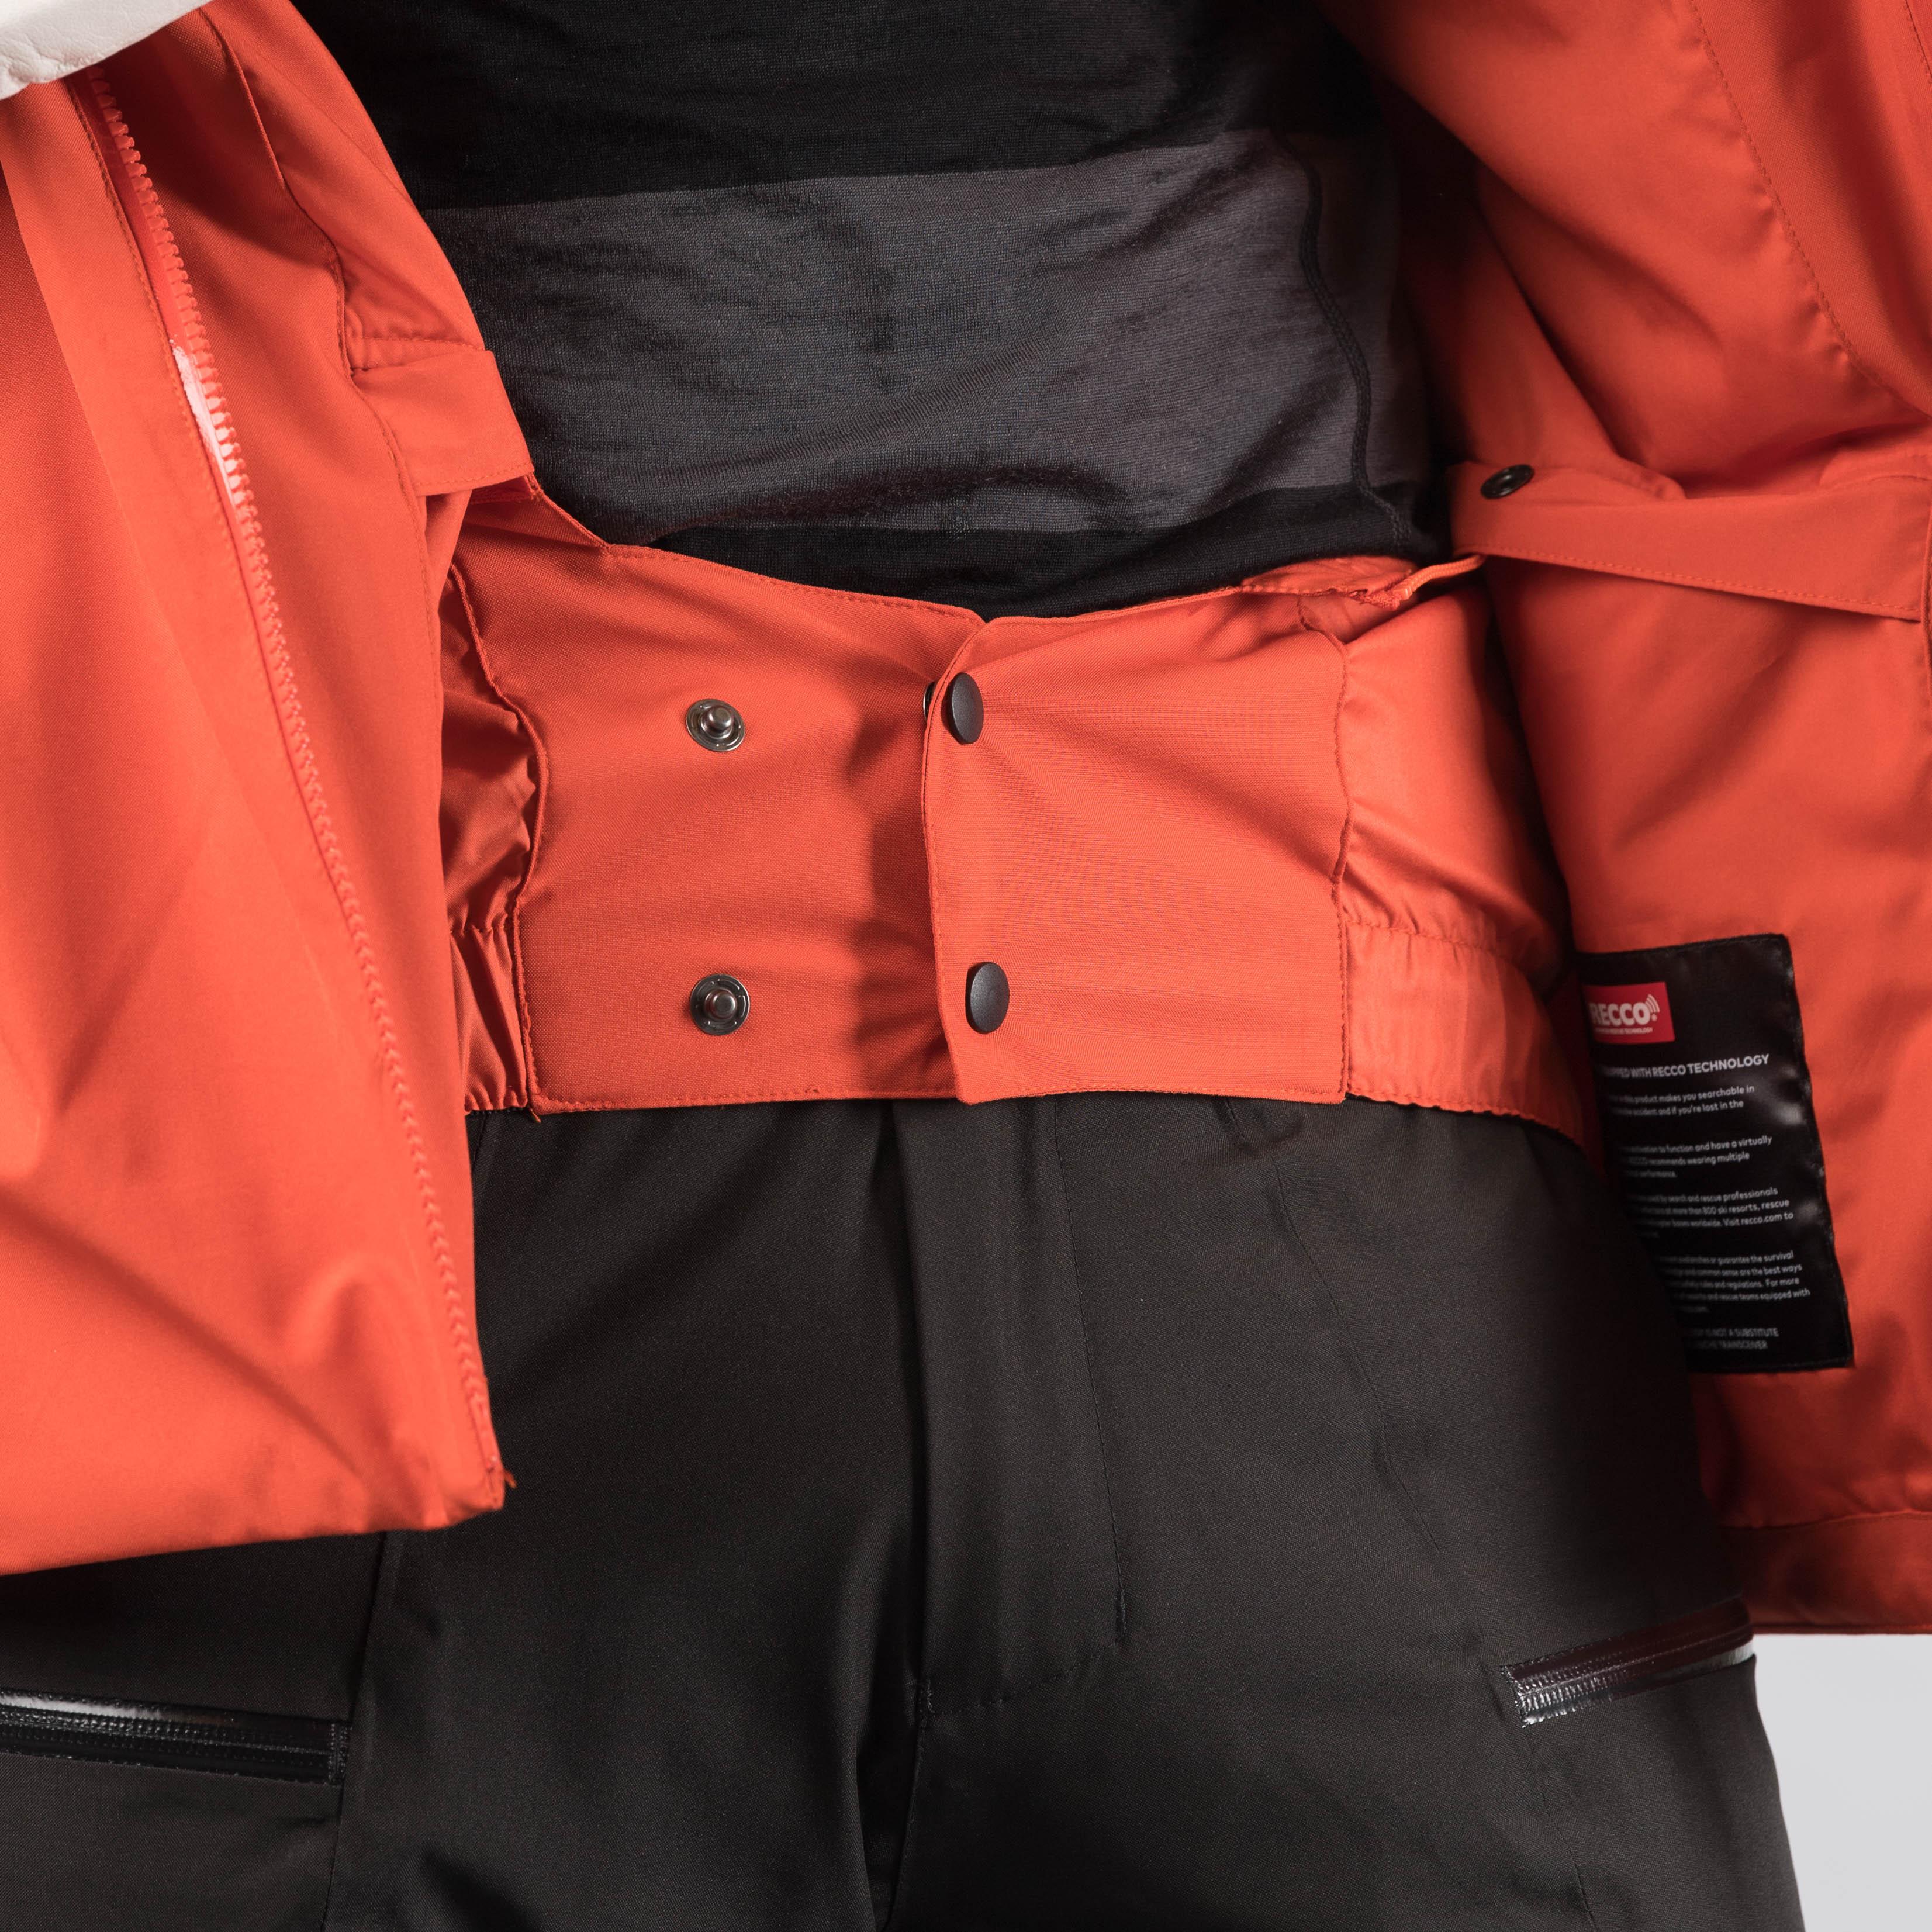 Stranda 2L Jacket